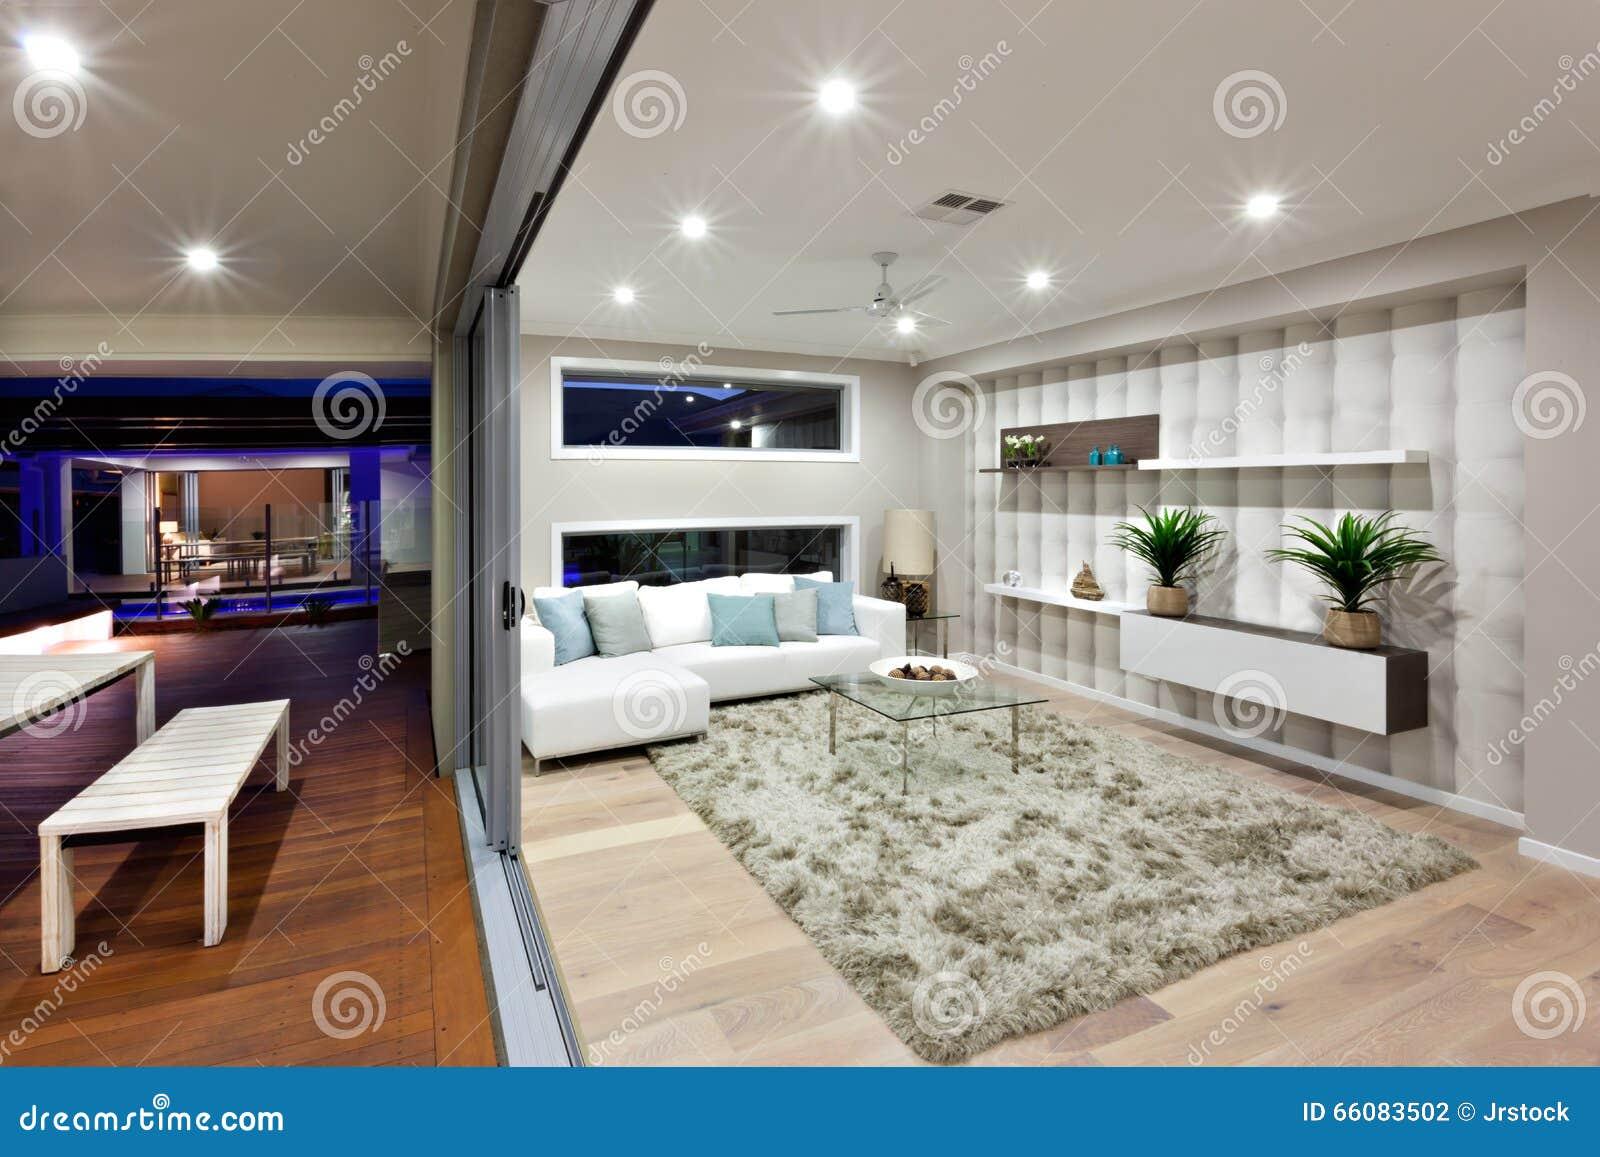 Iluminaci n moderna de la sala de estar con la decoraci n for Sala de estar noche